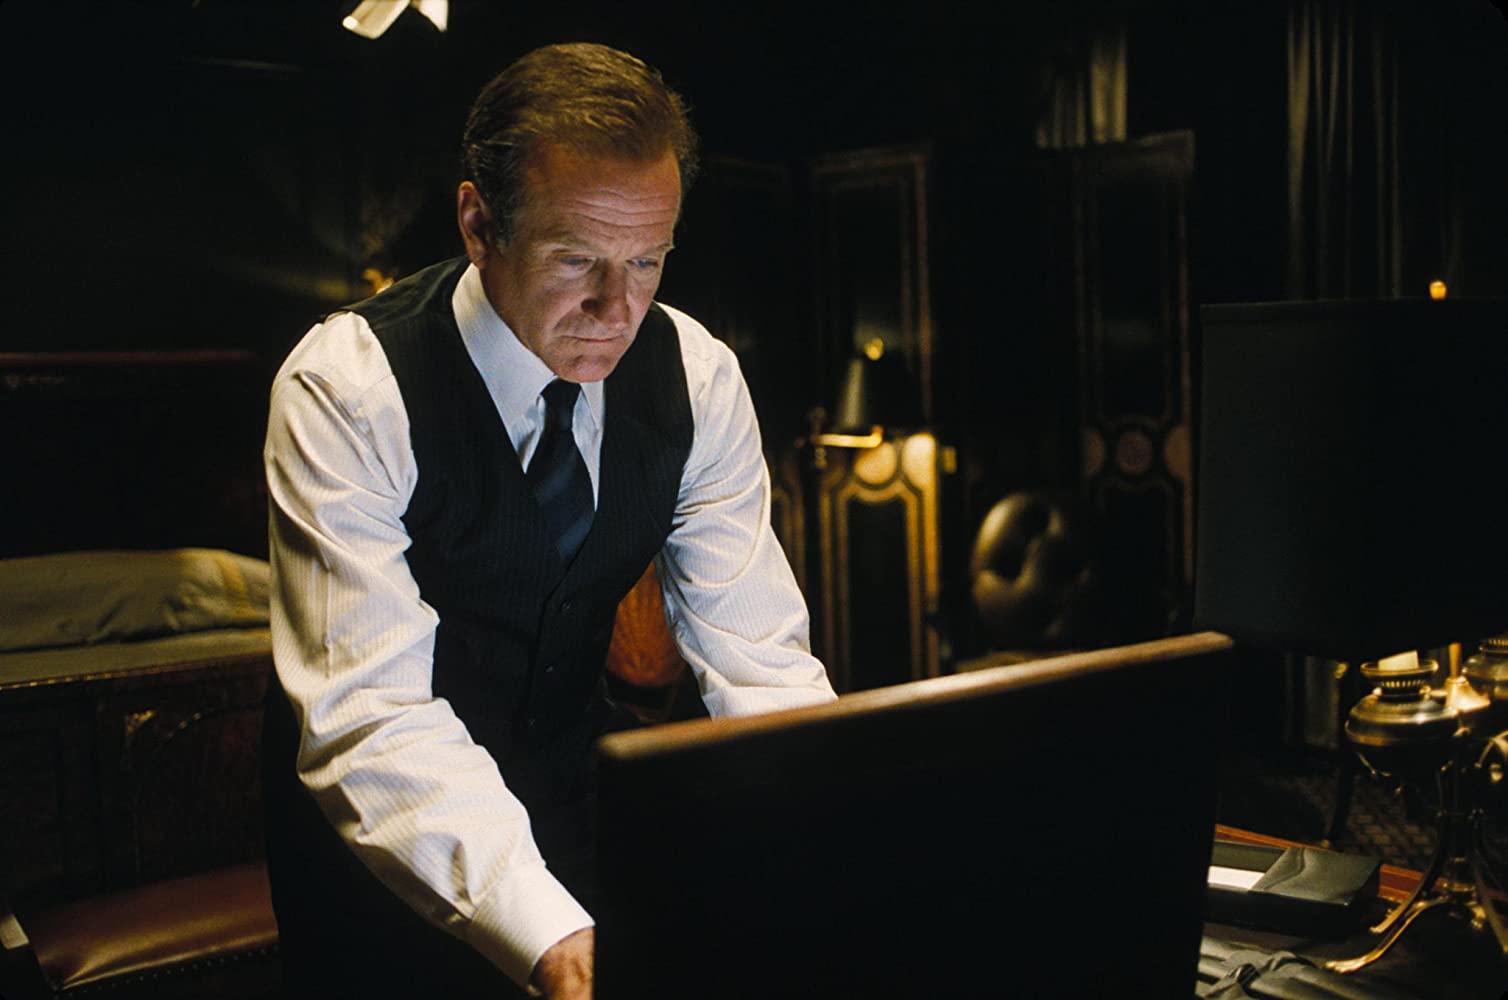 Robin Williams as Alan Hakman in The Final Cut (2004)